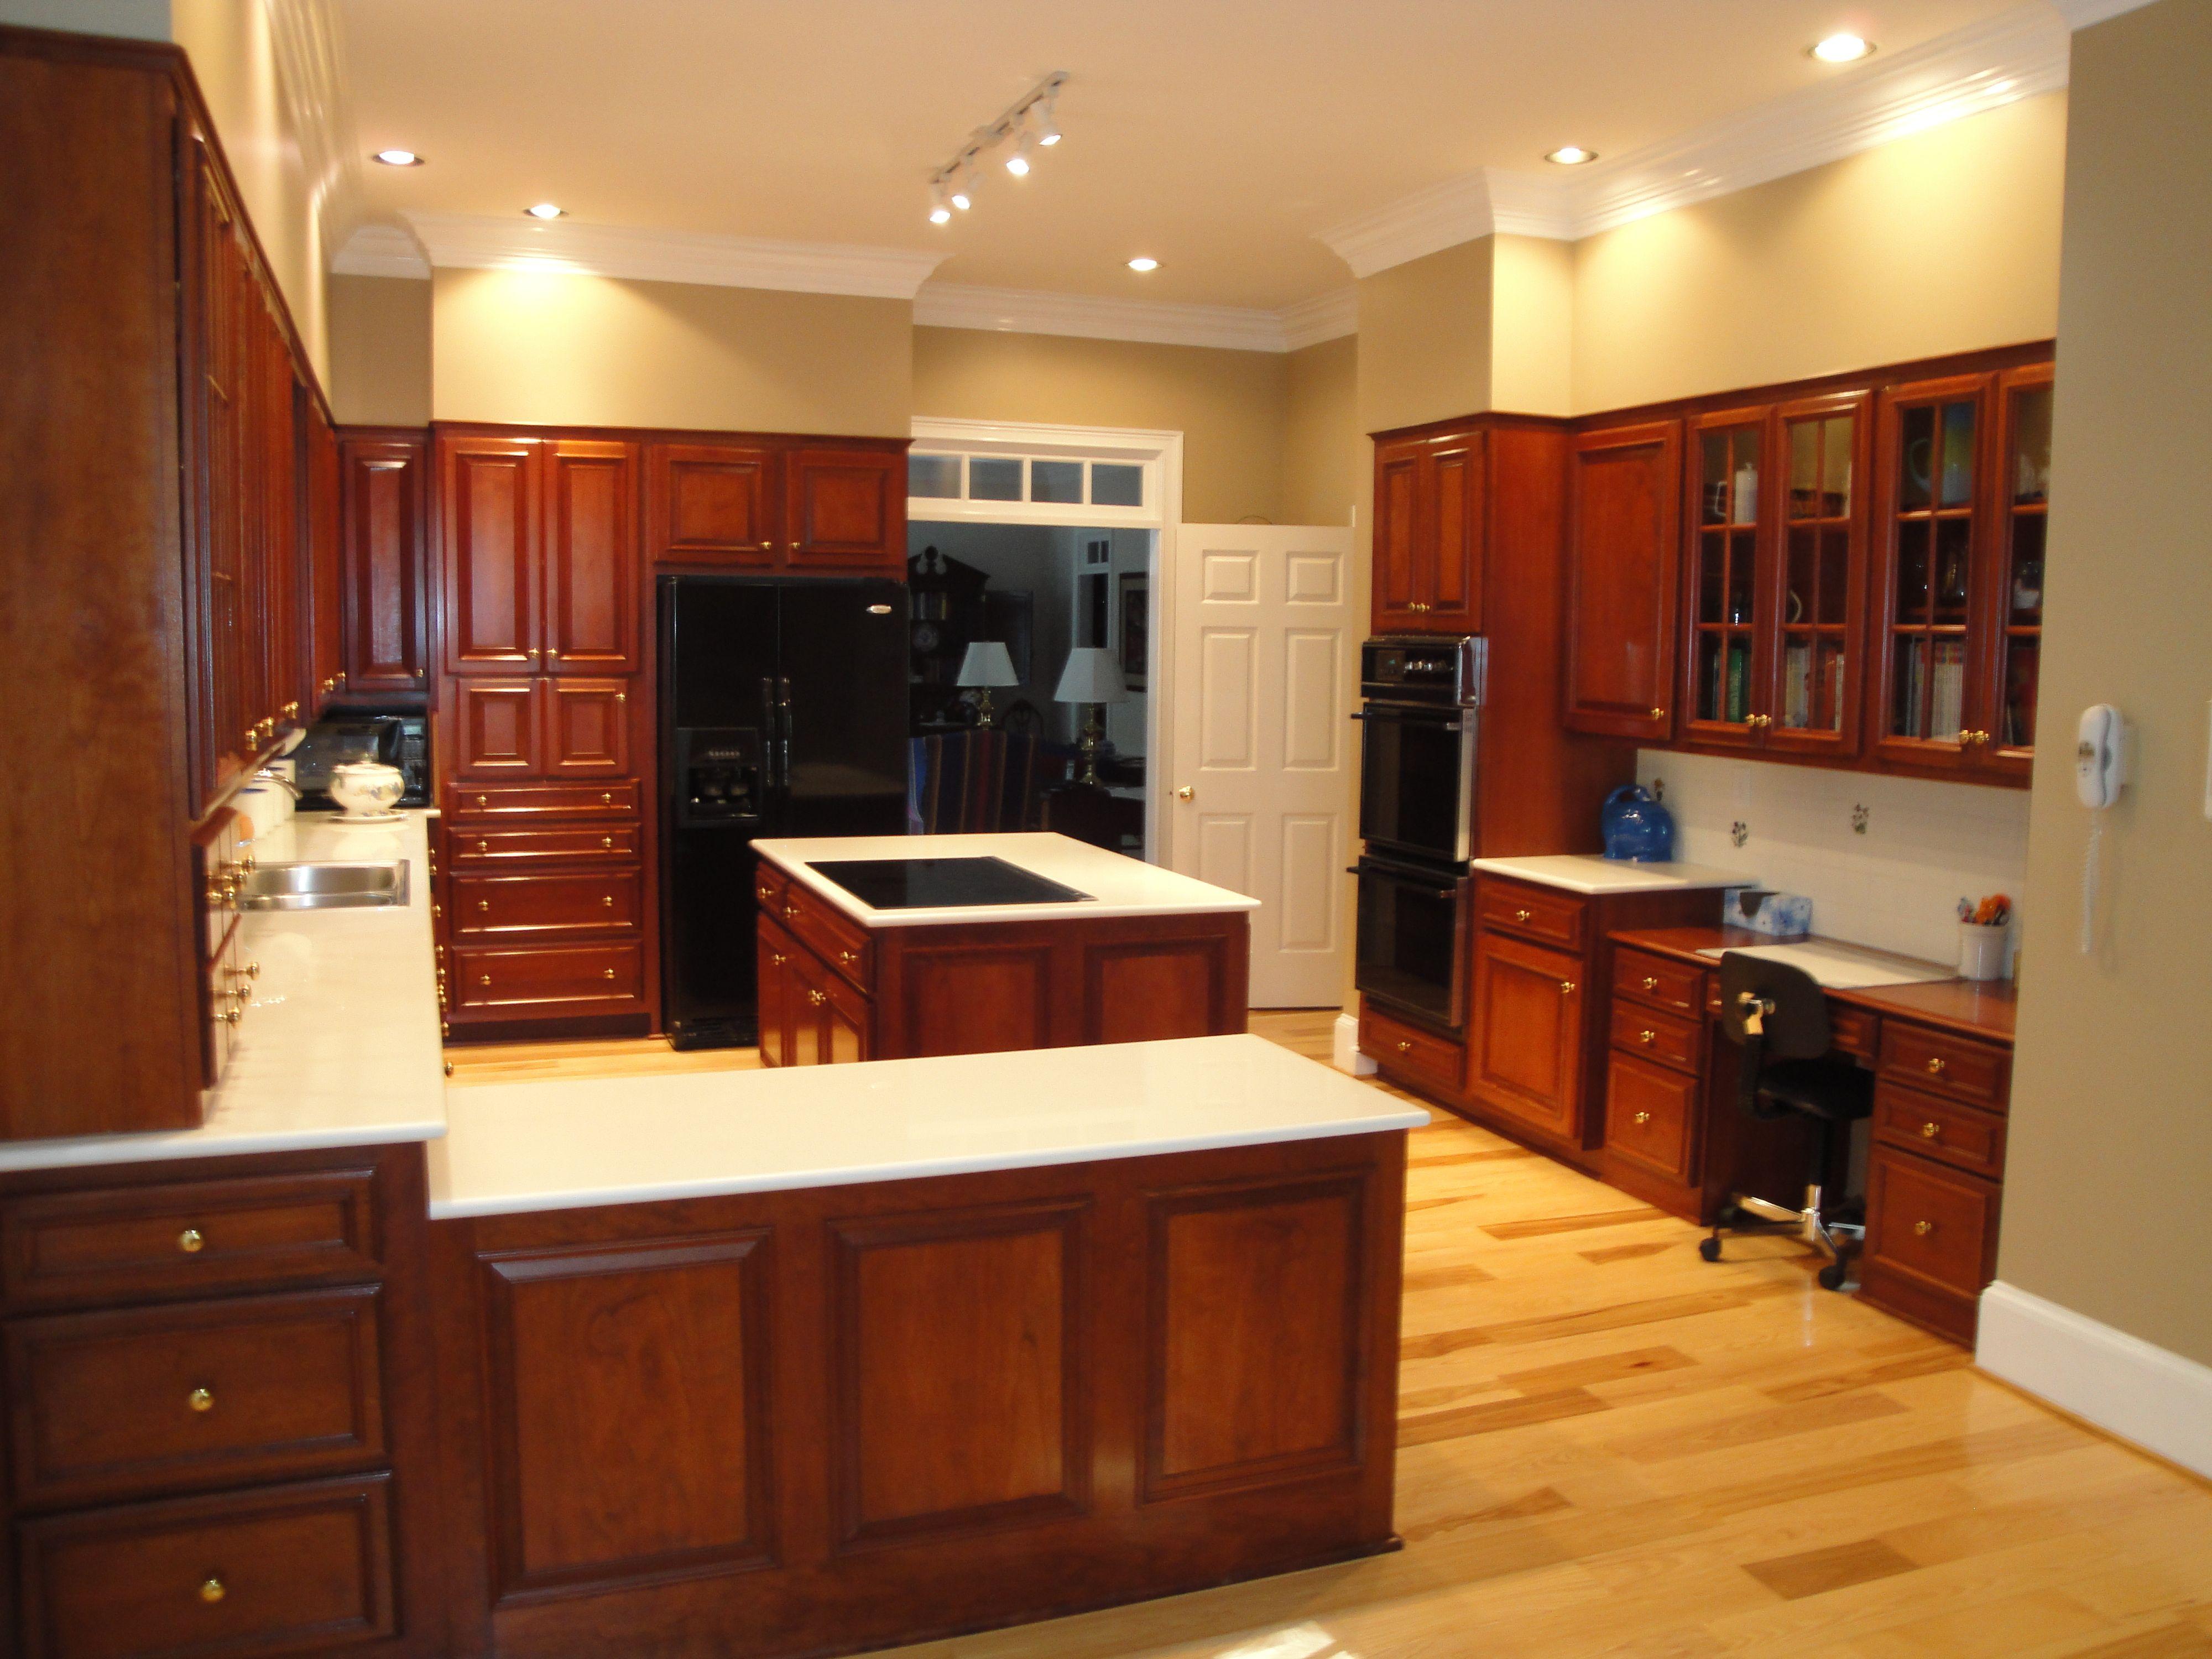 hickory floors, cherry Black appliances. Counter